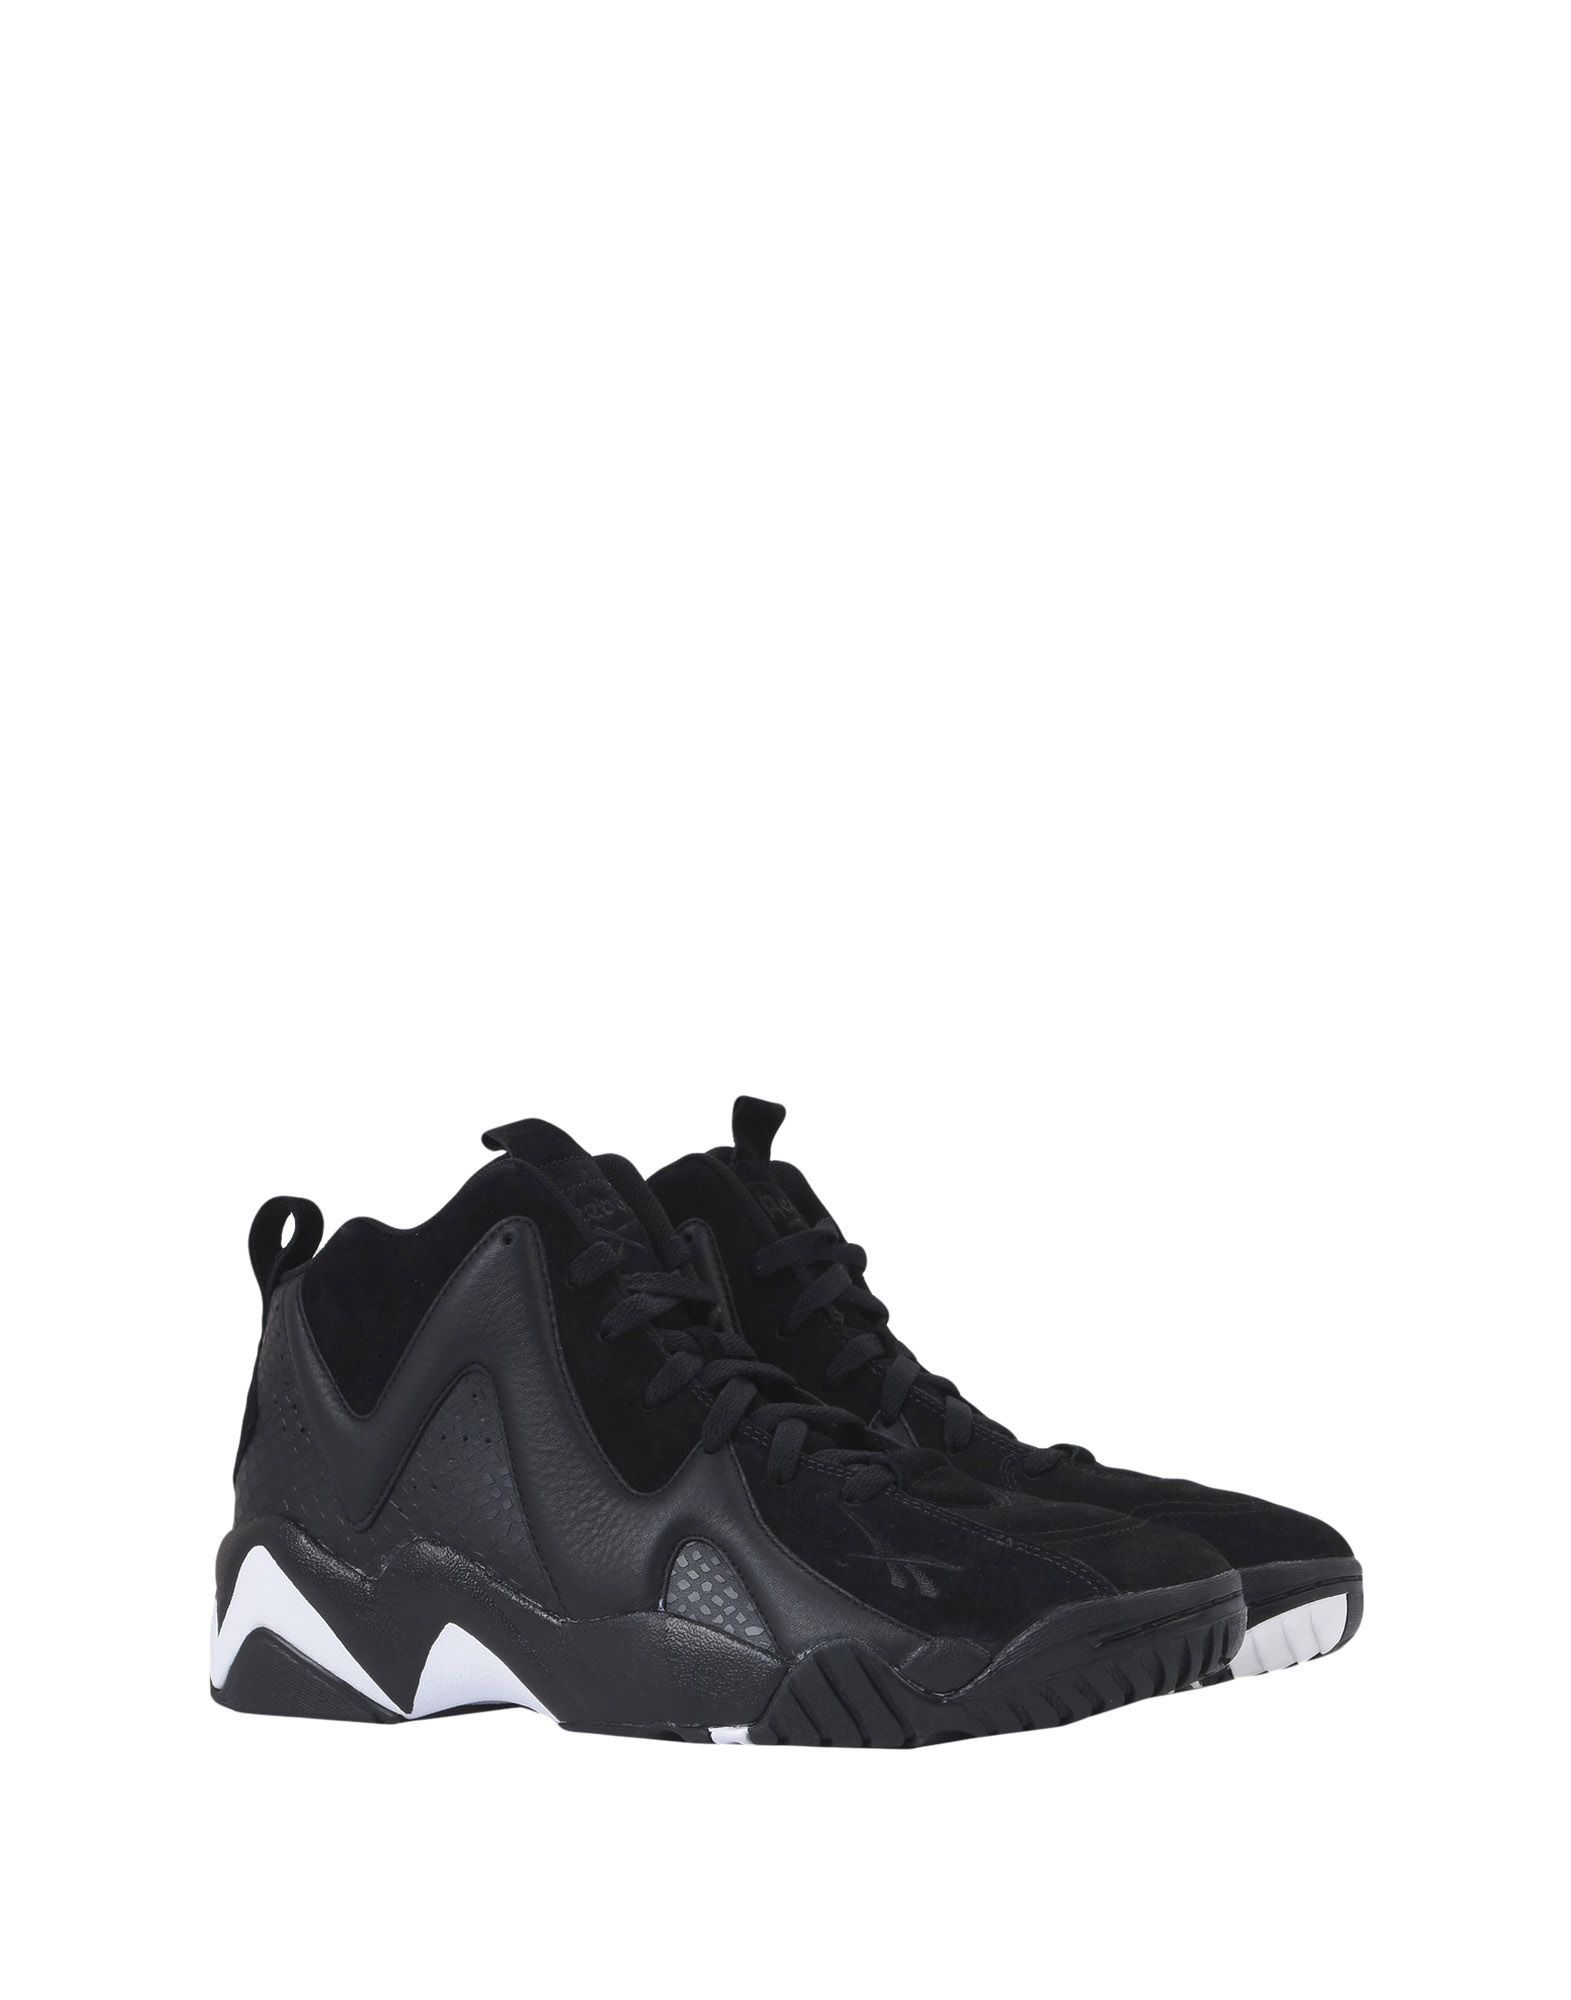 Sneakers Reebok Kamikaze Ii Atl-Lax - Homme - Sneakers Reebok sur